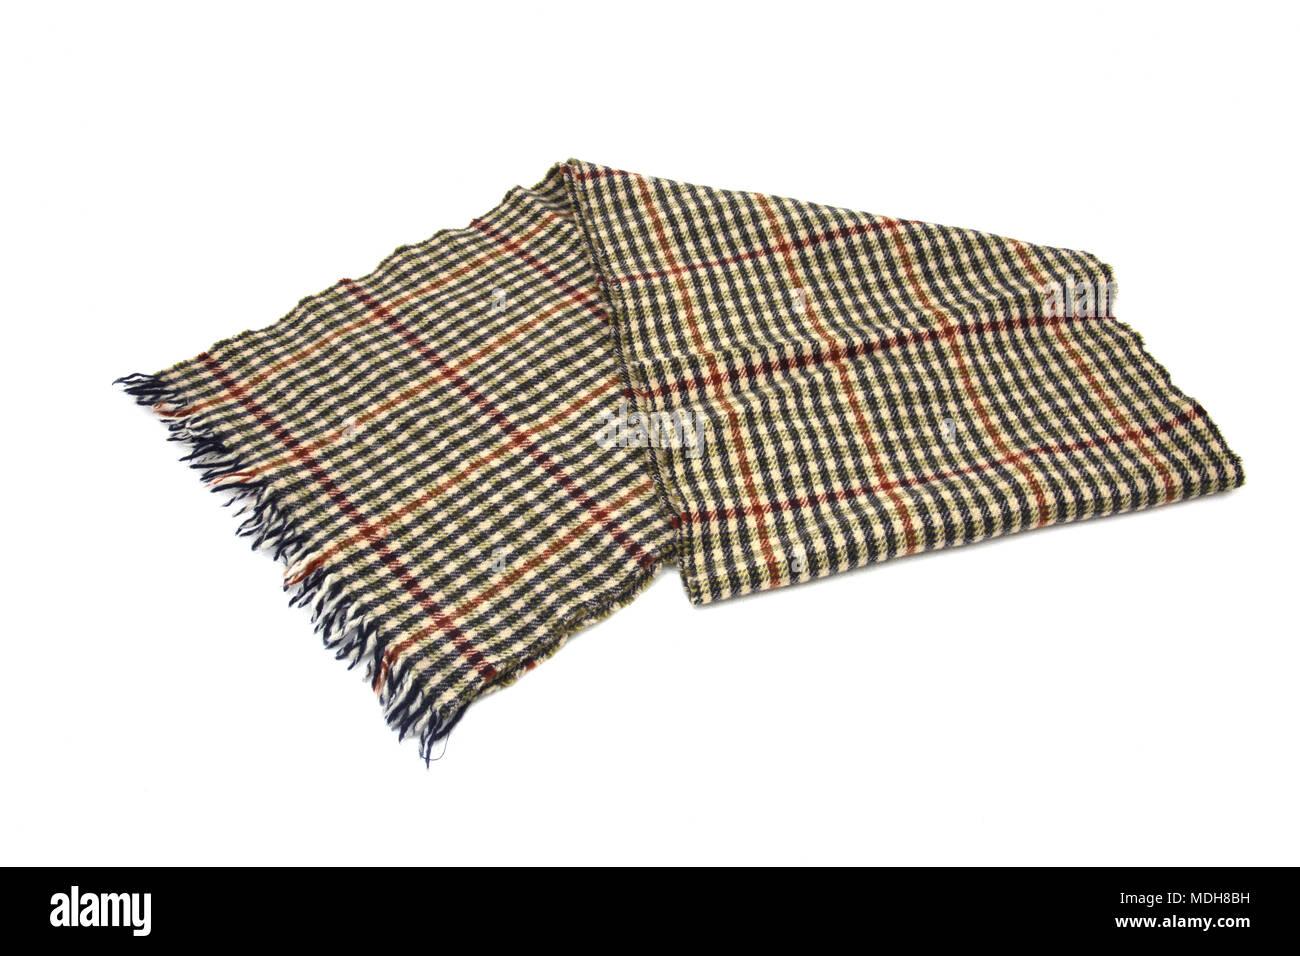 Beige, Brown and Black Wool Scarf - Stock Image